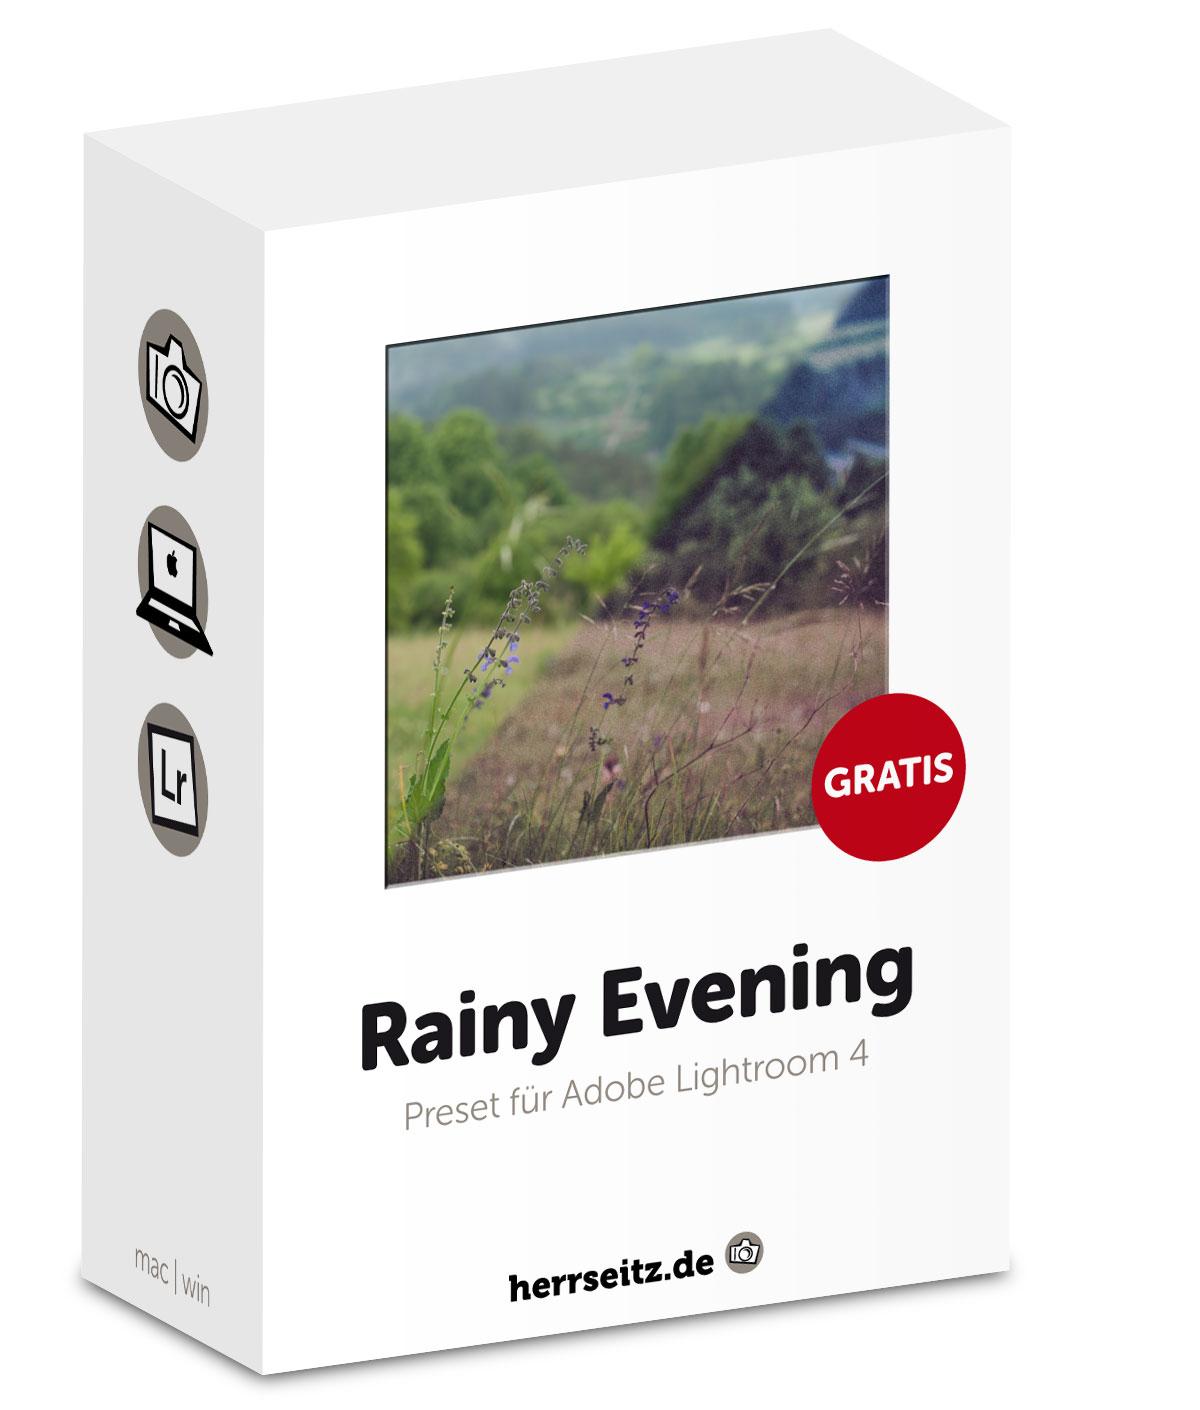 Preset für Adobe Lightroom 4: Rainy Evening